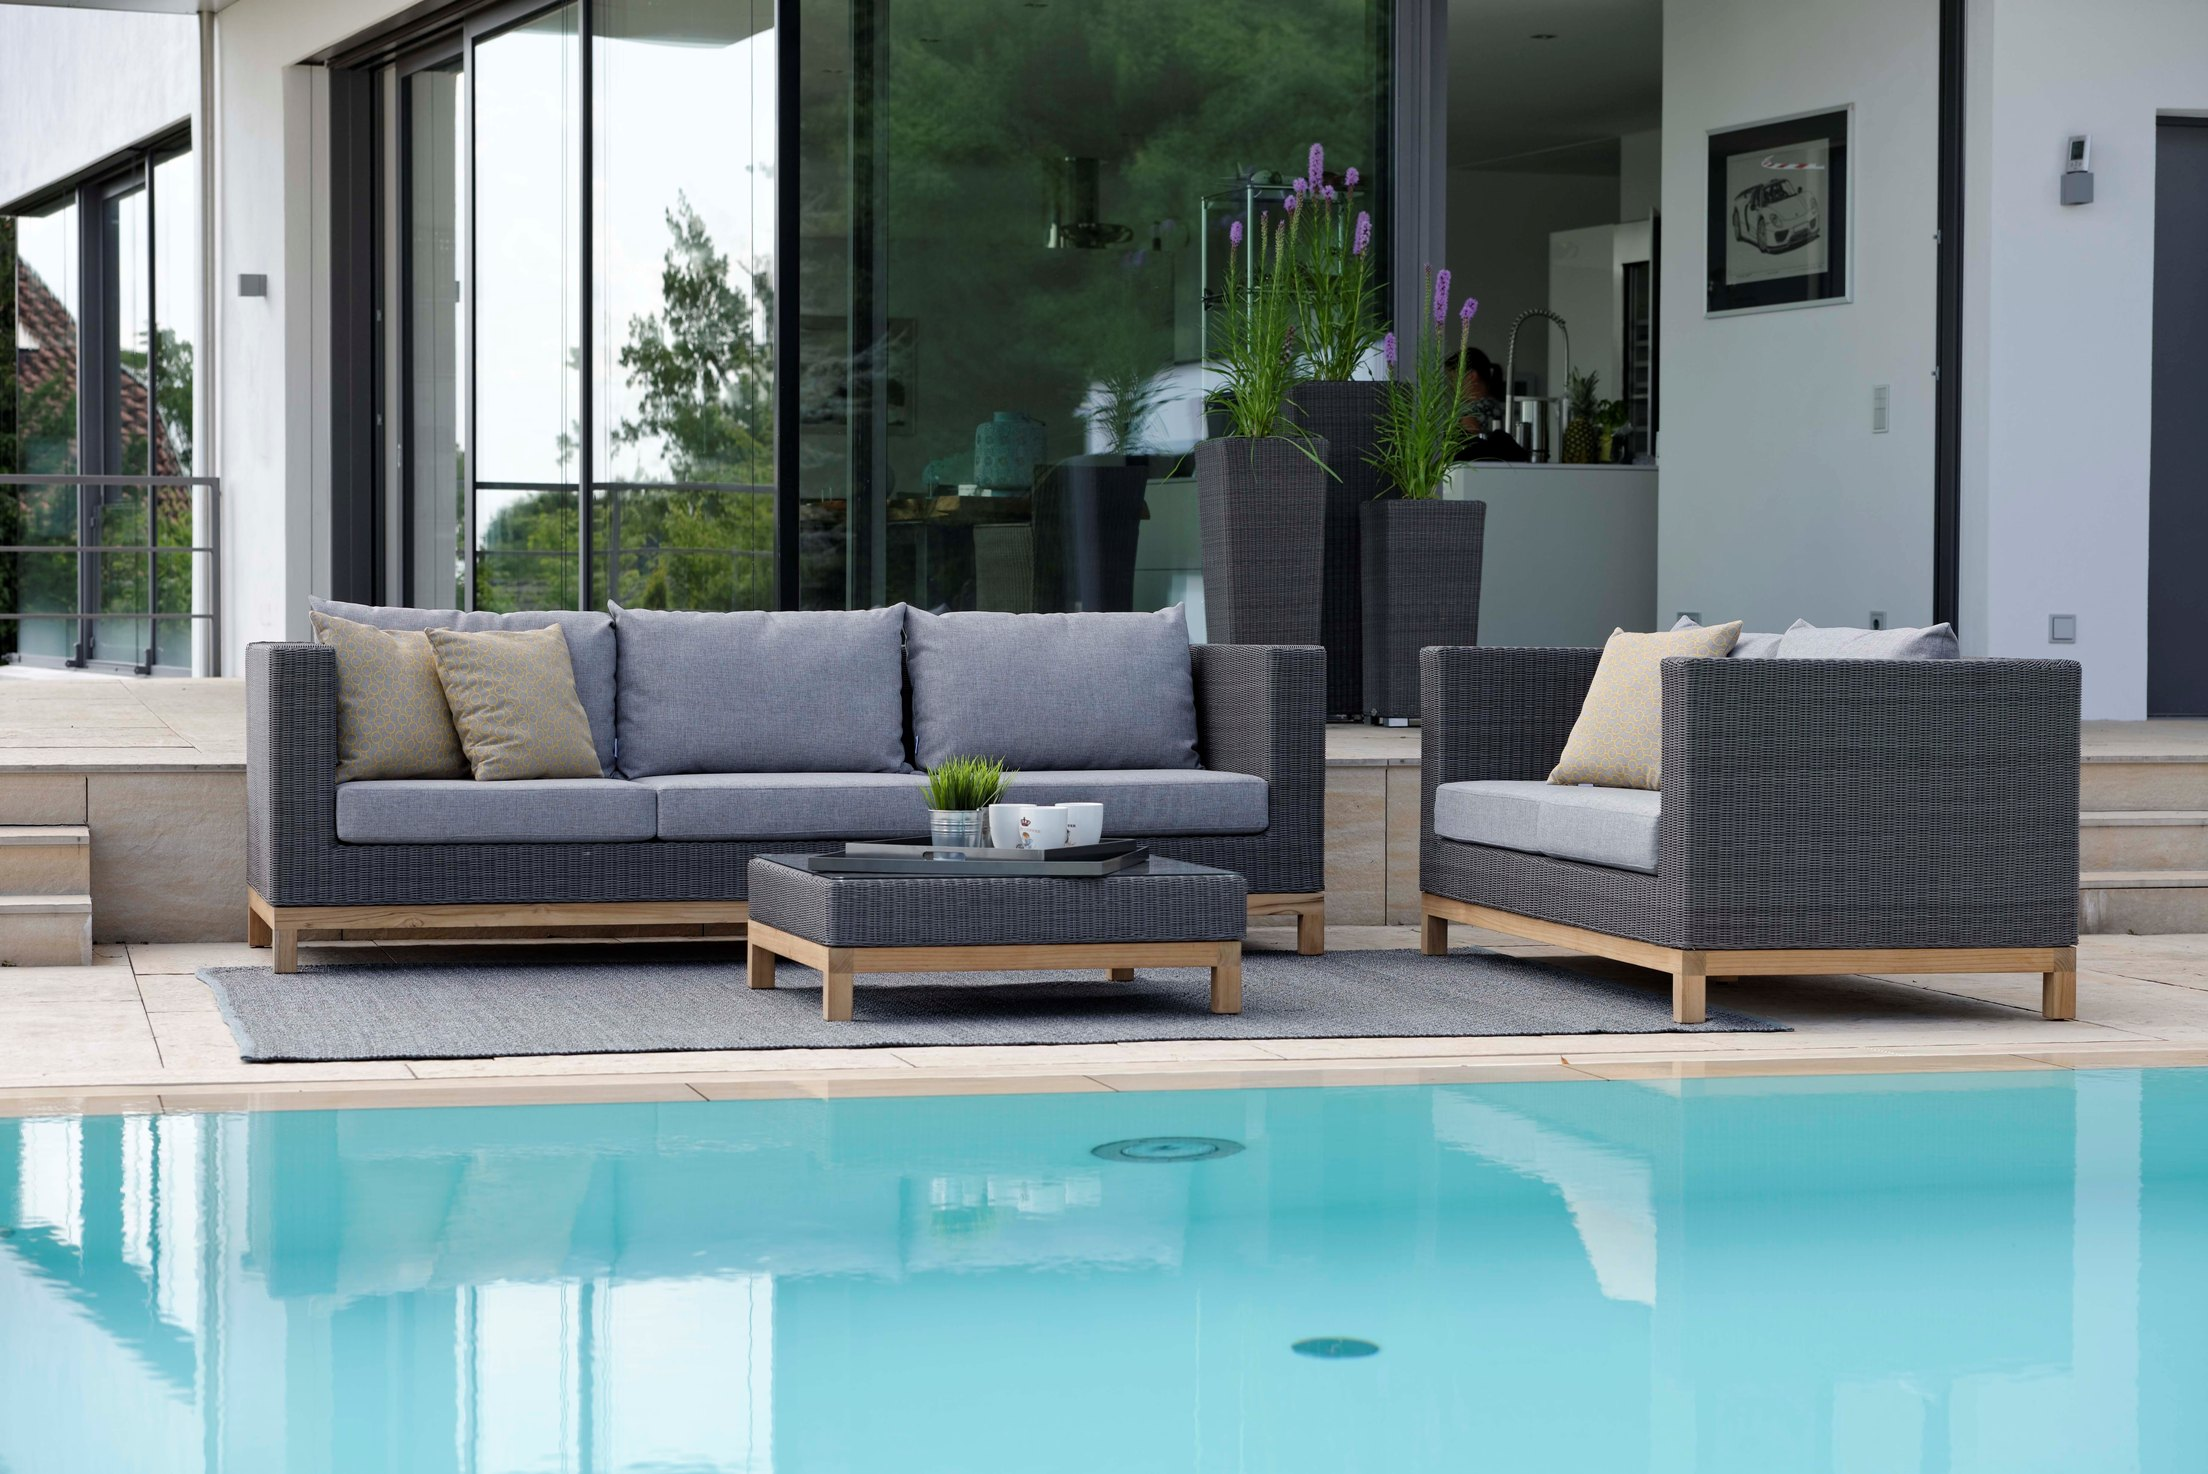 teak gartenm bel x markt einsiedler massivm bel polsterm bel gartenm bel. Black Bedroom Furniture Sets. Home Design Ideas